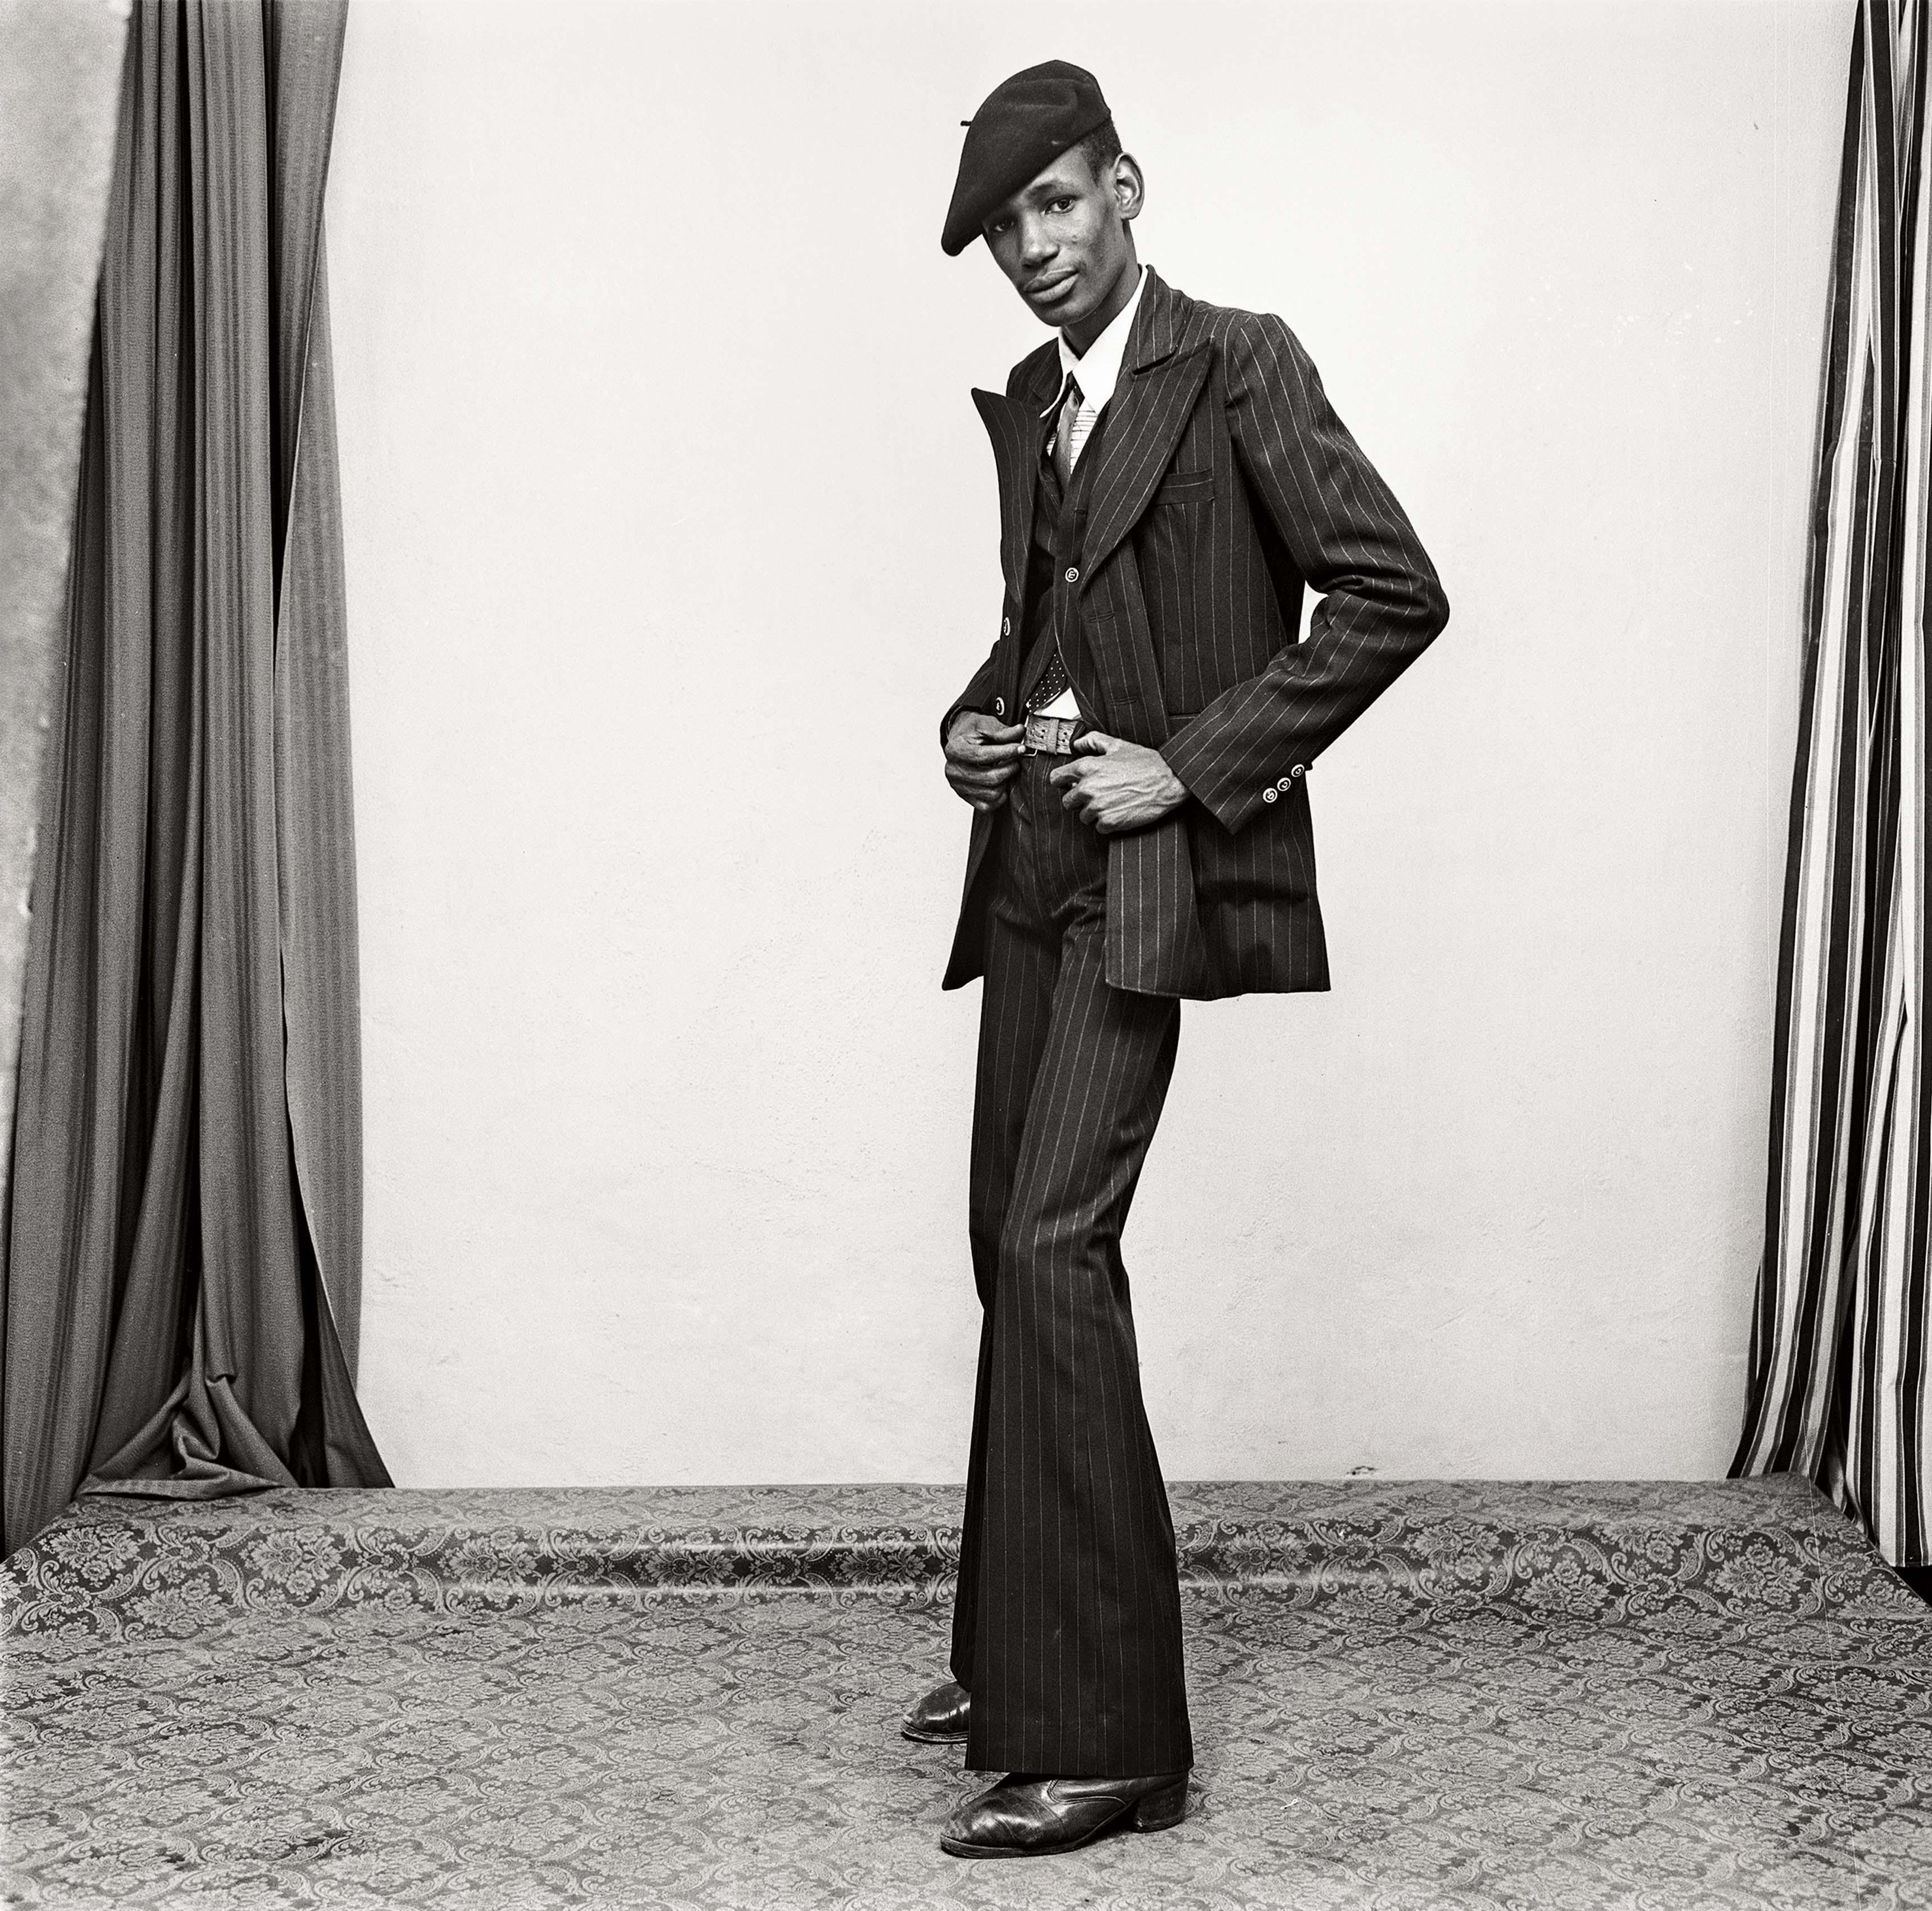 Malick Sidibé Un gentleman en position, 1980 Tirage gélatino-argentique signé, 2013 50,5 x 40,5 cm Courtesy Galerie MAGNIN-A, Paris © Malick Sidibé